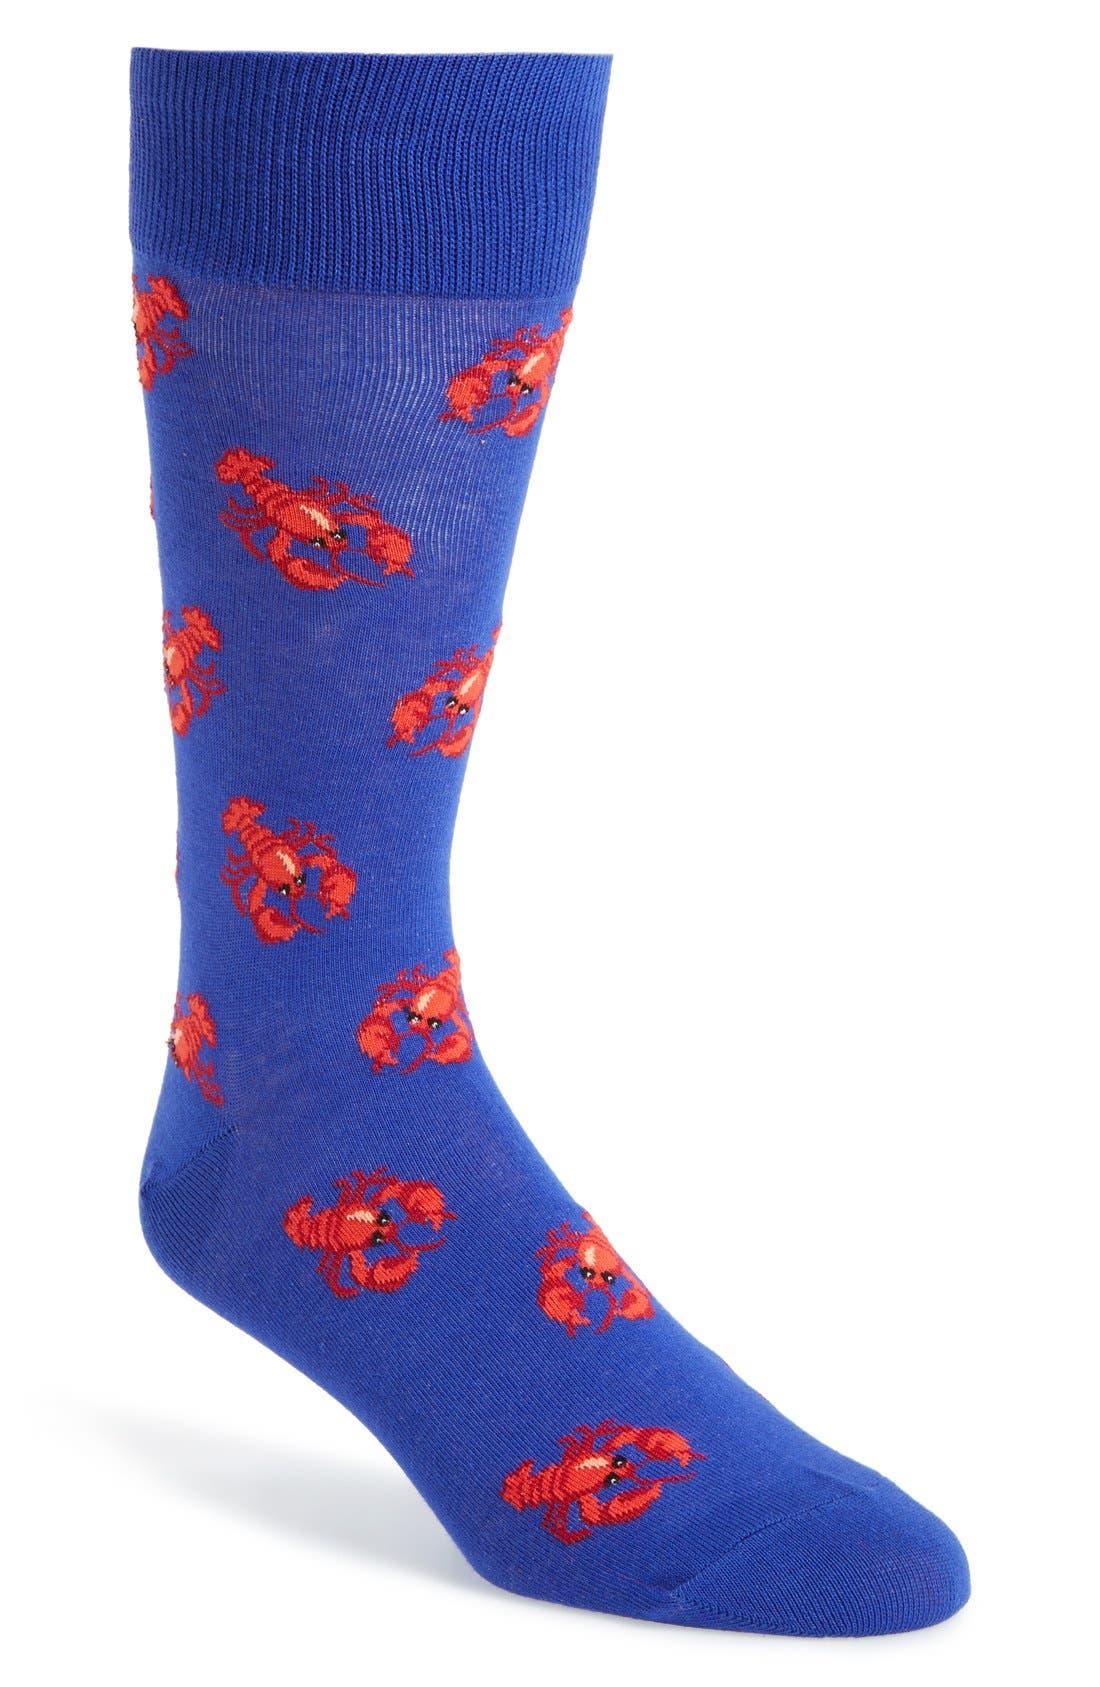 Alternate Image 1 Selected - Hot Sox 'Lobster' Socks